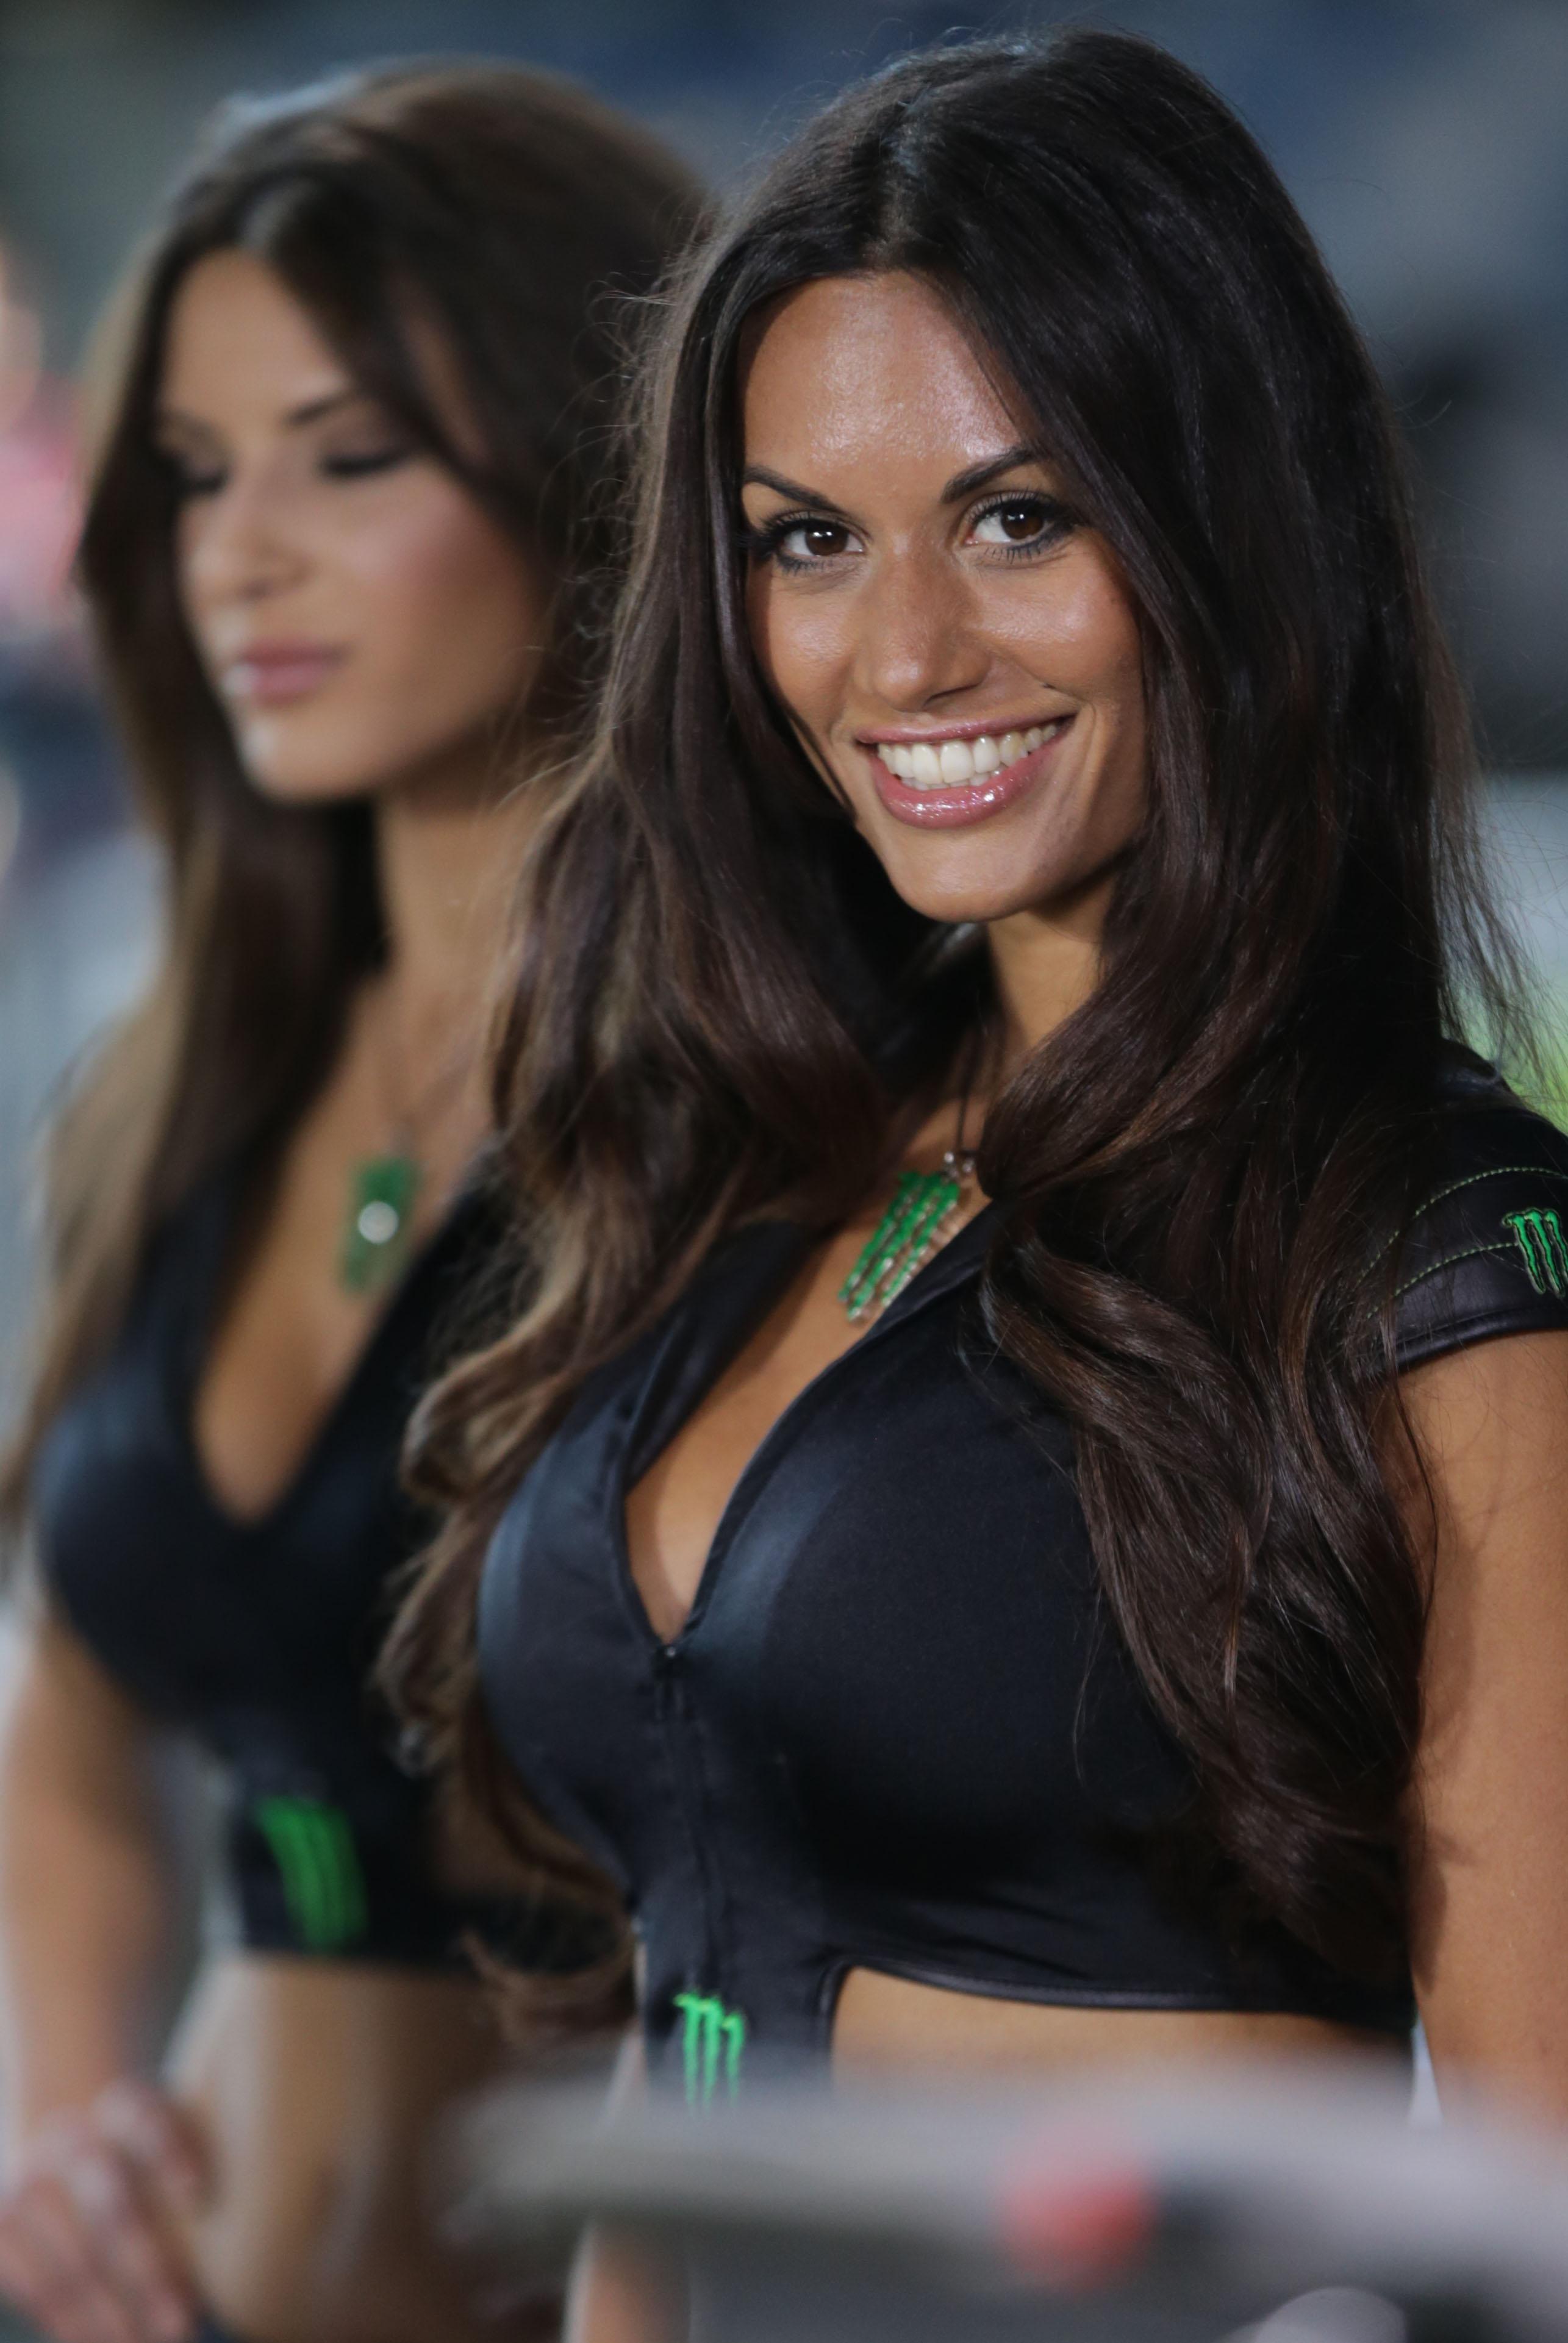 Donington SBK Grid Girls beauty Beautiful Woman t